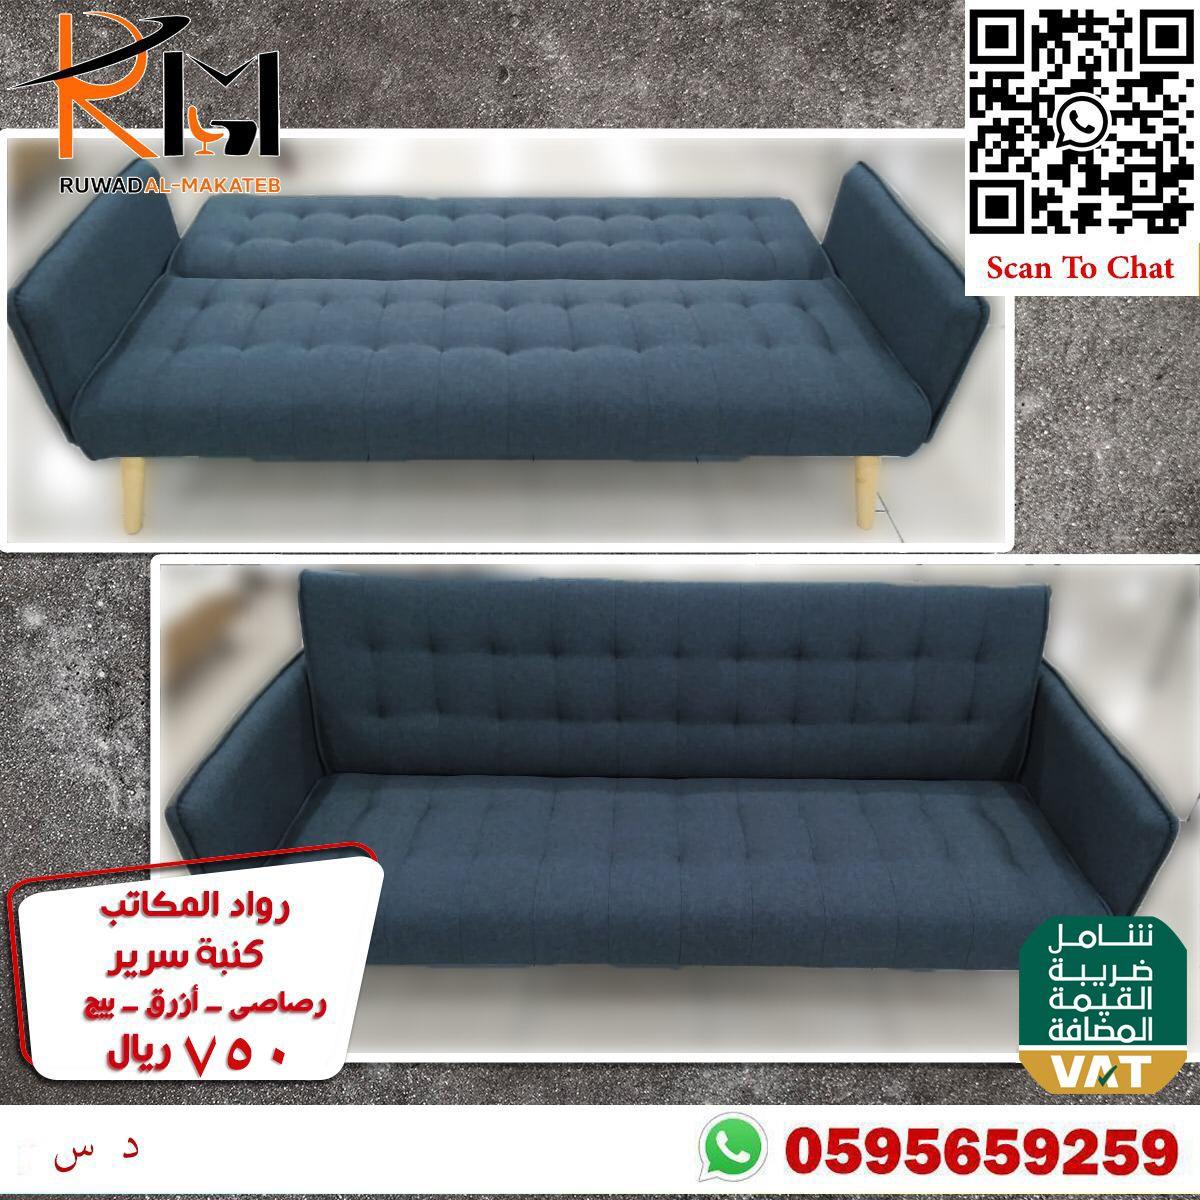 كنب سرير أزرق In 2021 Furniture Sofa Couch